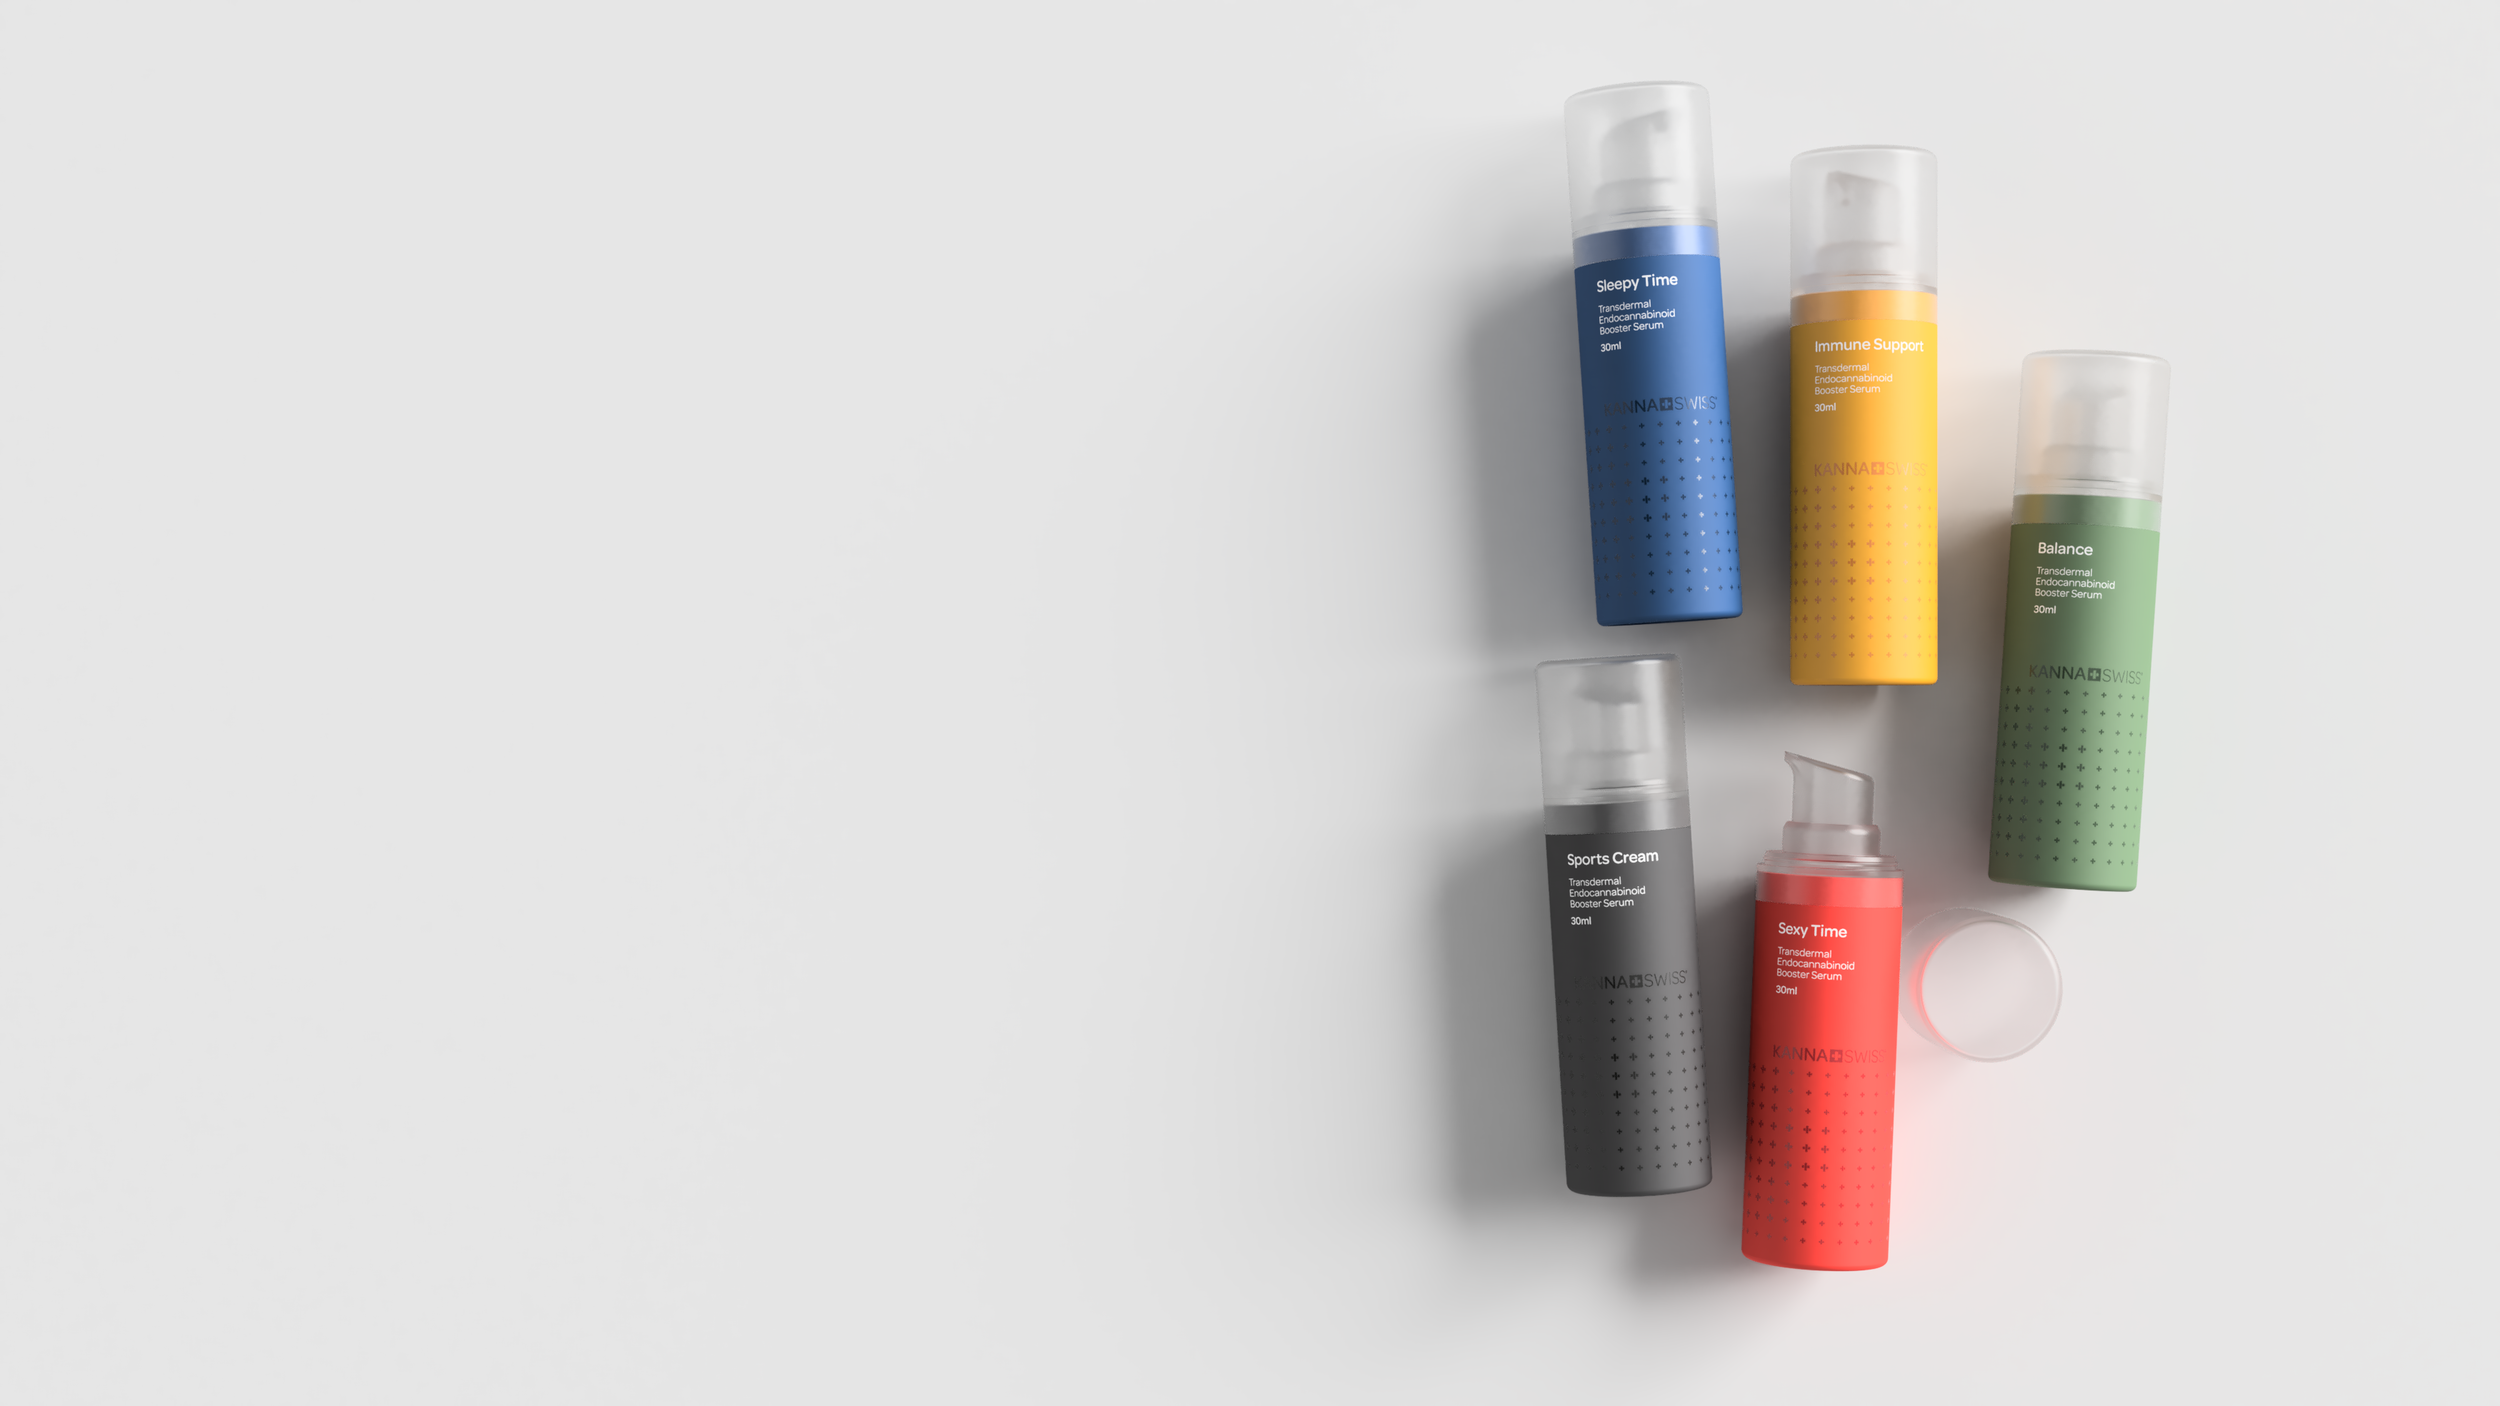 Products — Kannaswiss